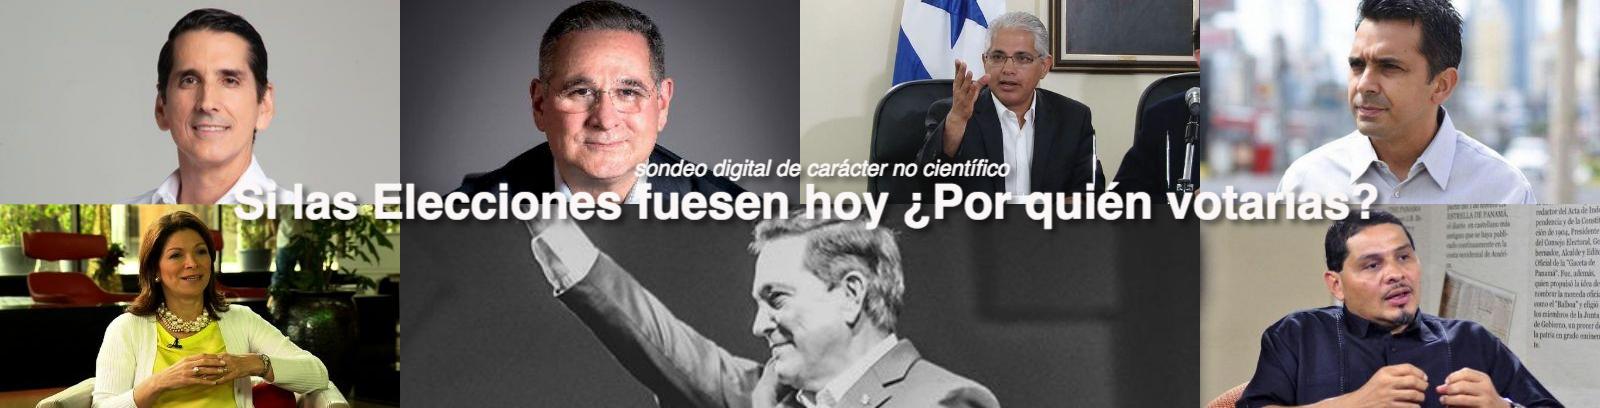 sondeo digital 3